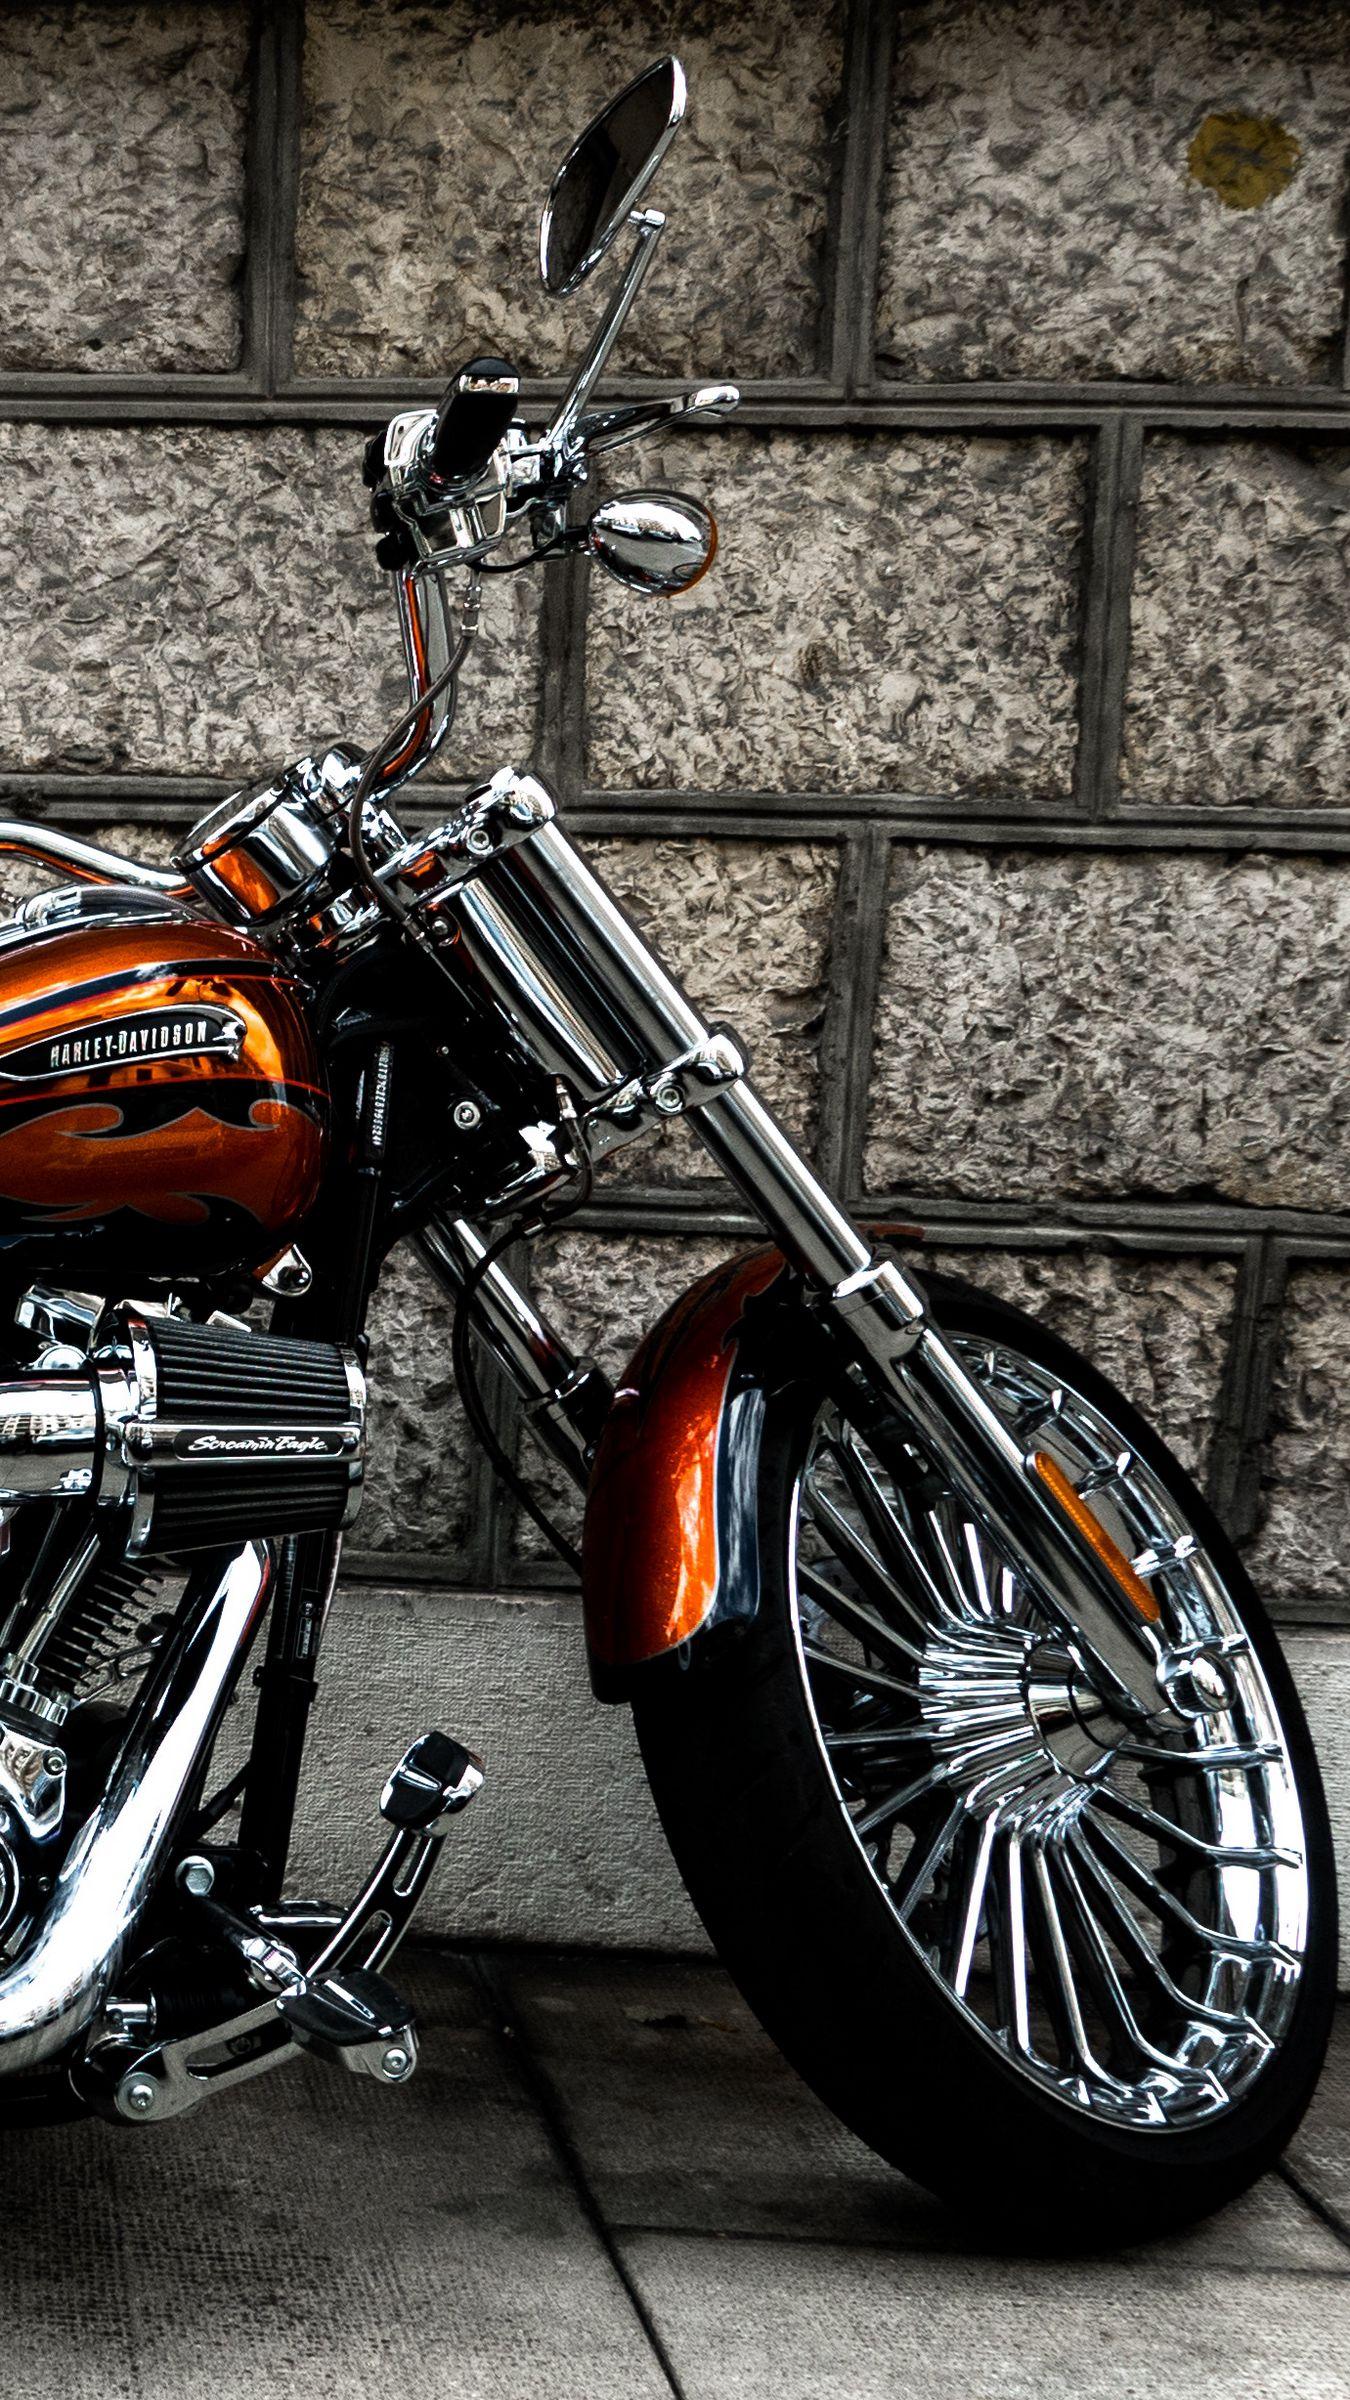 1350x2400 Wallpaper motorcycle, bike, side view, wheel